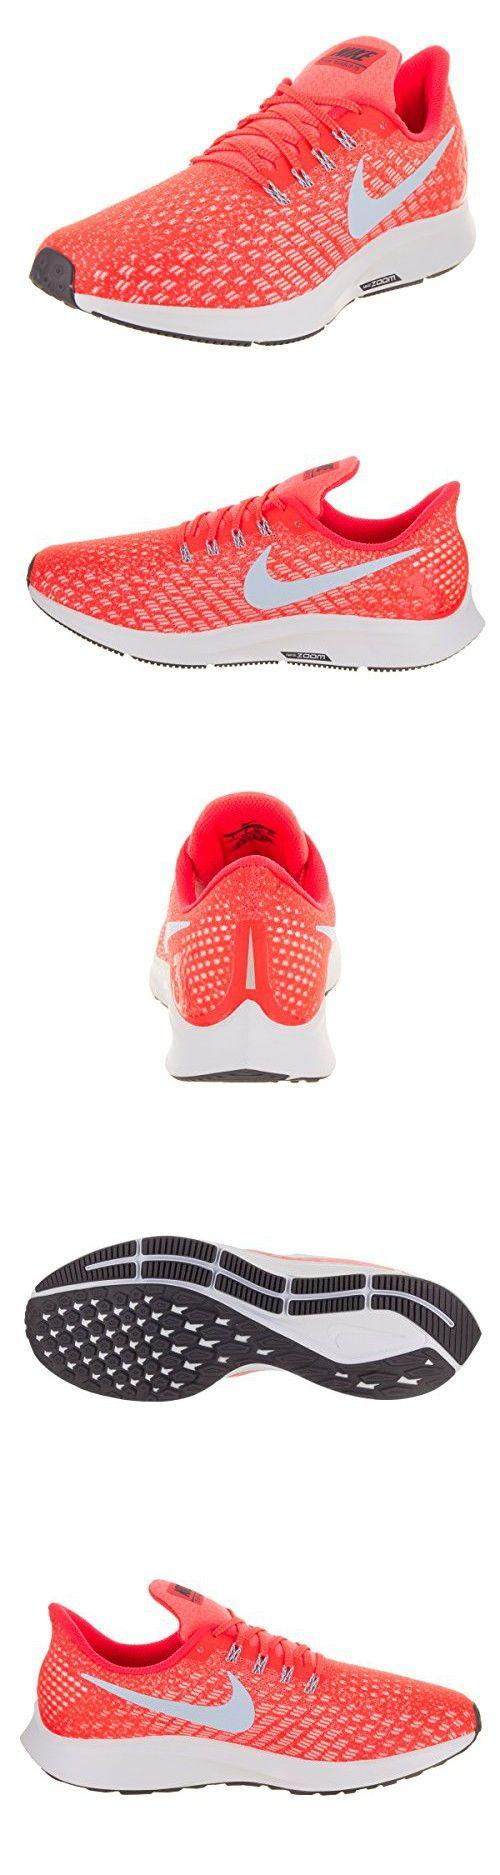 e30e4b1ce NIKE Men's Air Zoom Pegasus 35 Running Shoes (14 D US, Bright Crimson/Ice  Blue/Sail)